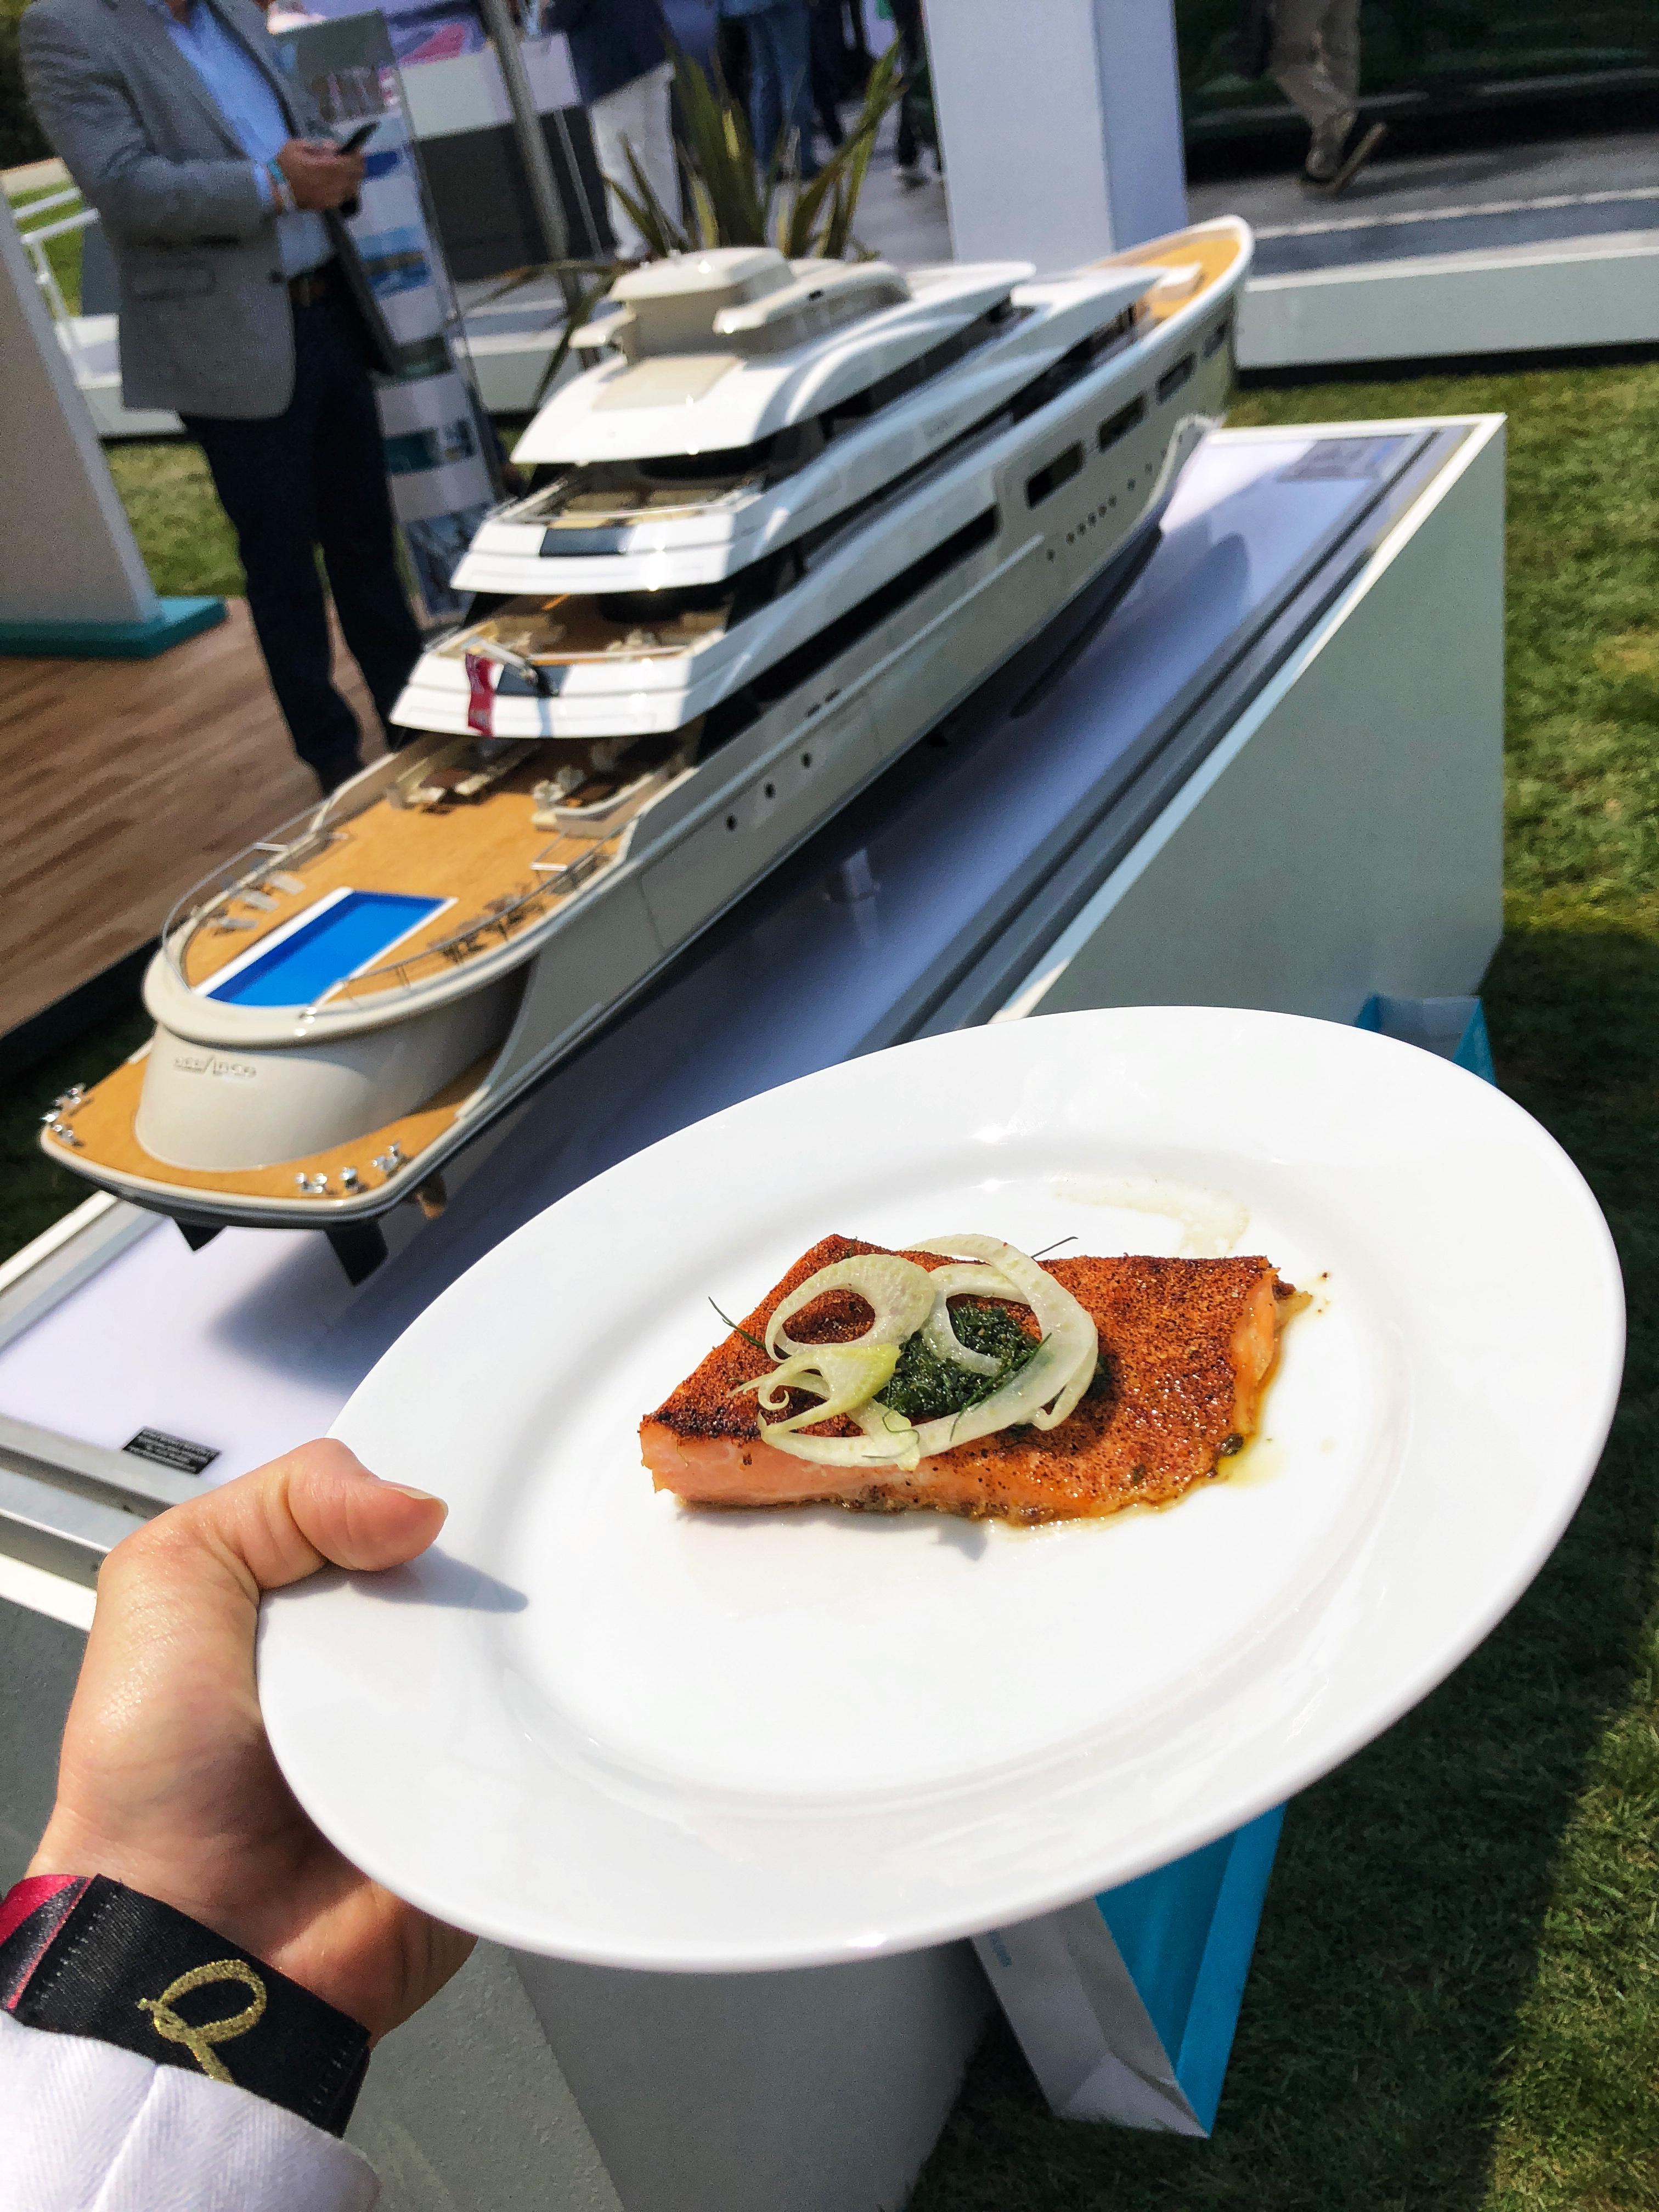 burgess-yachts-salmon-quail-monterey